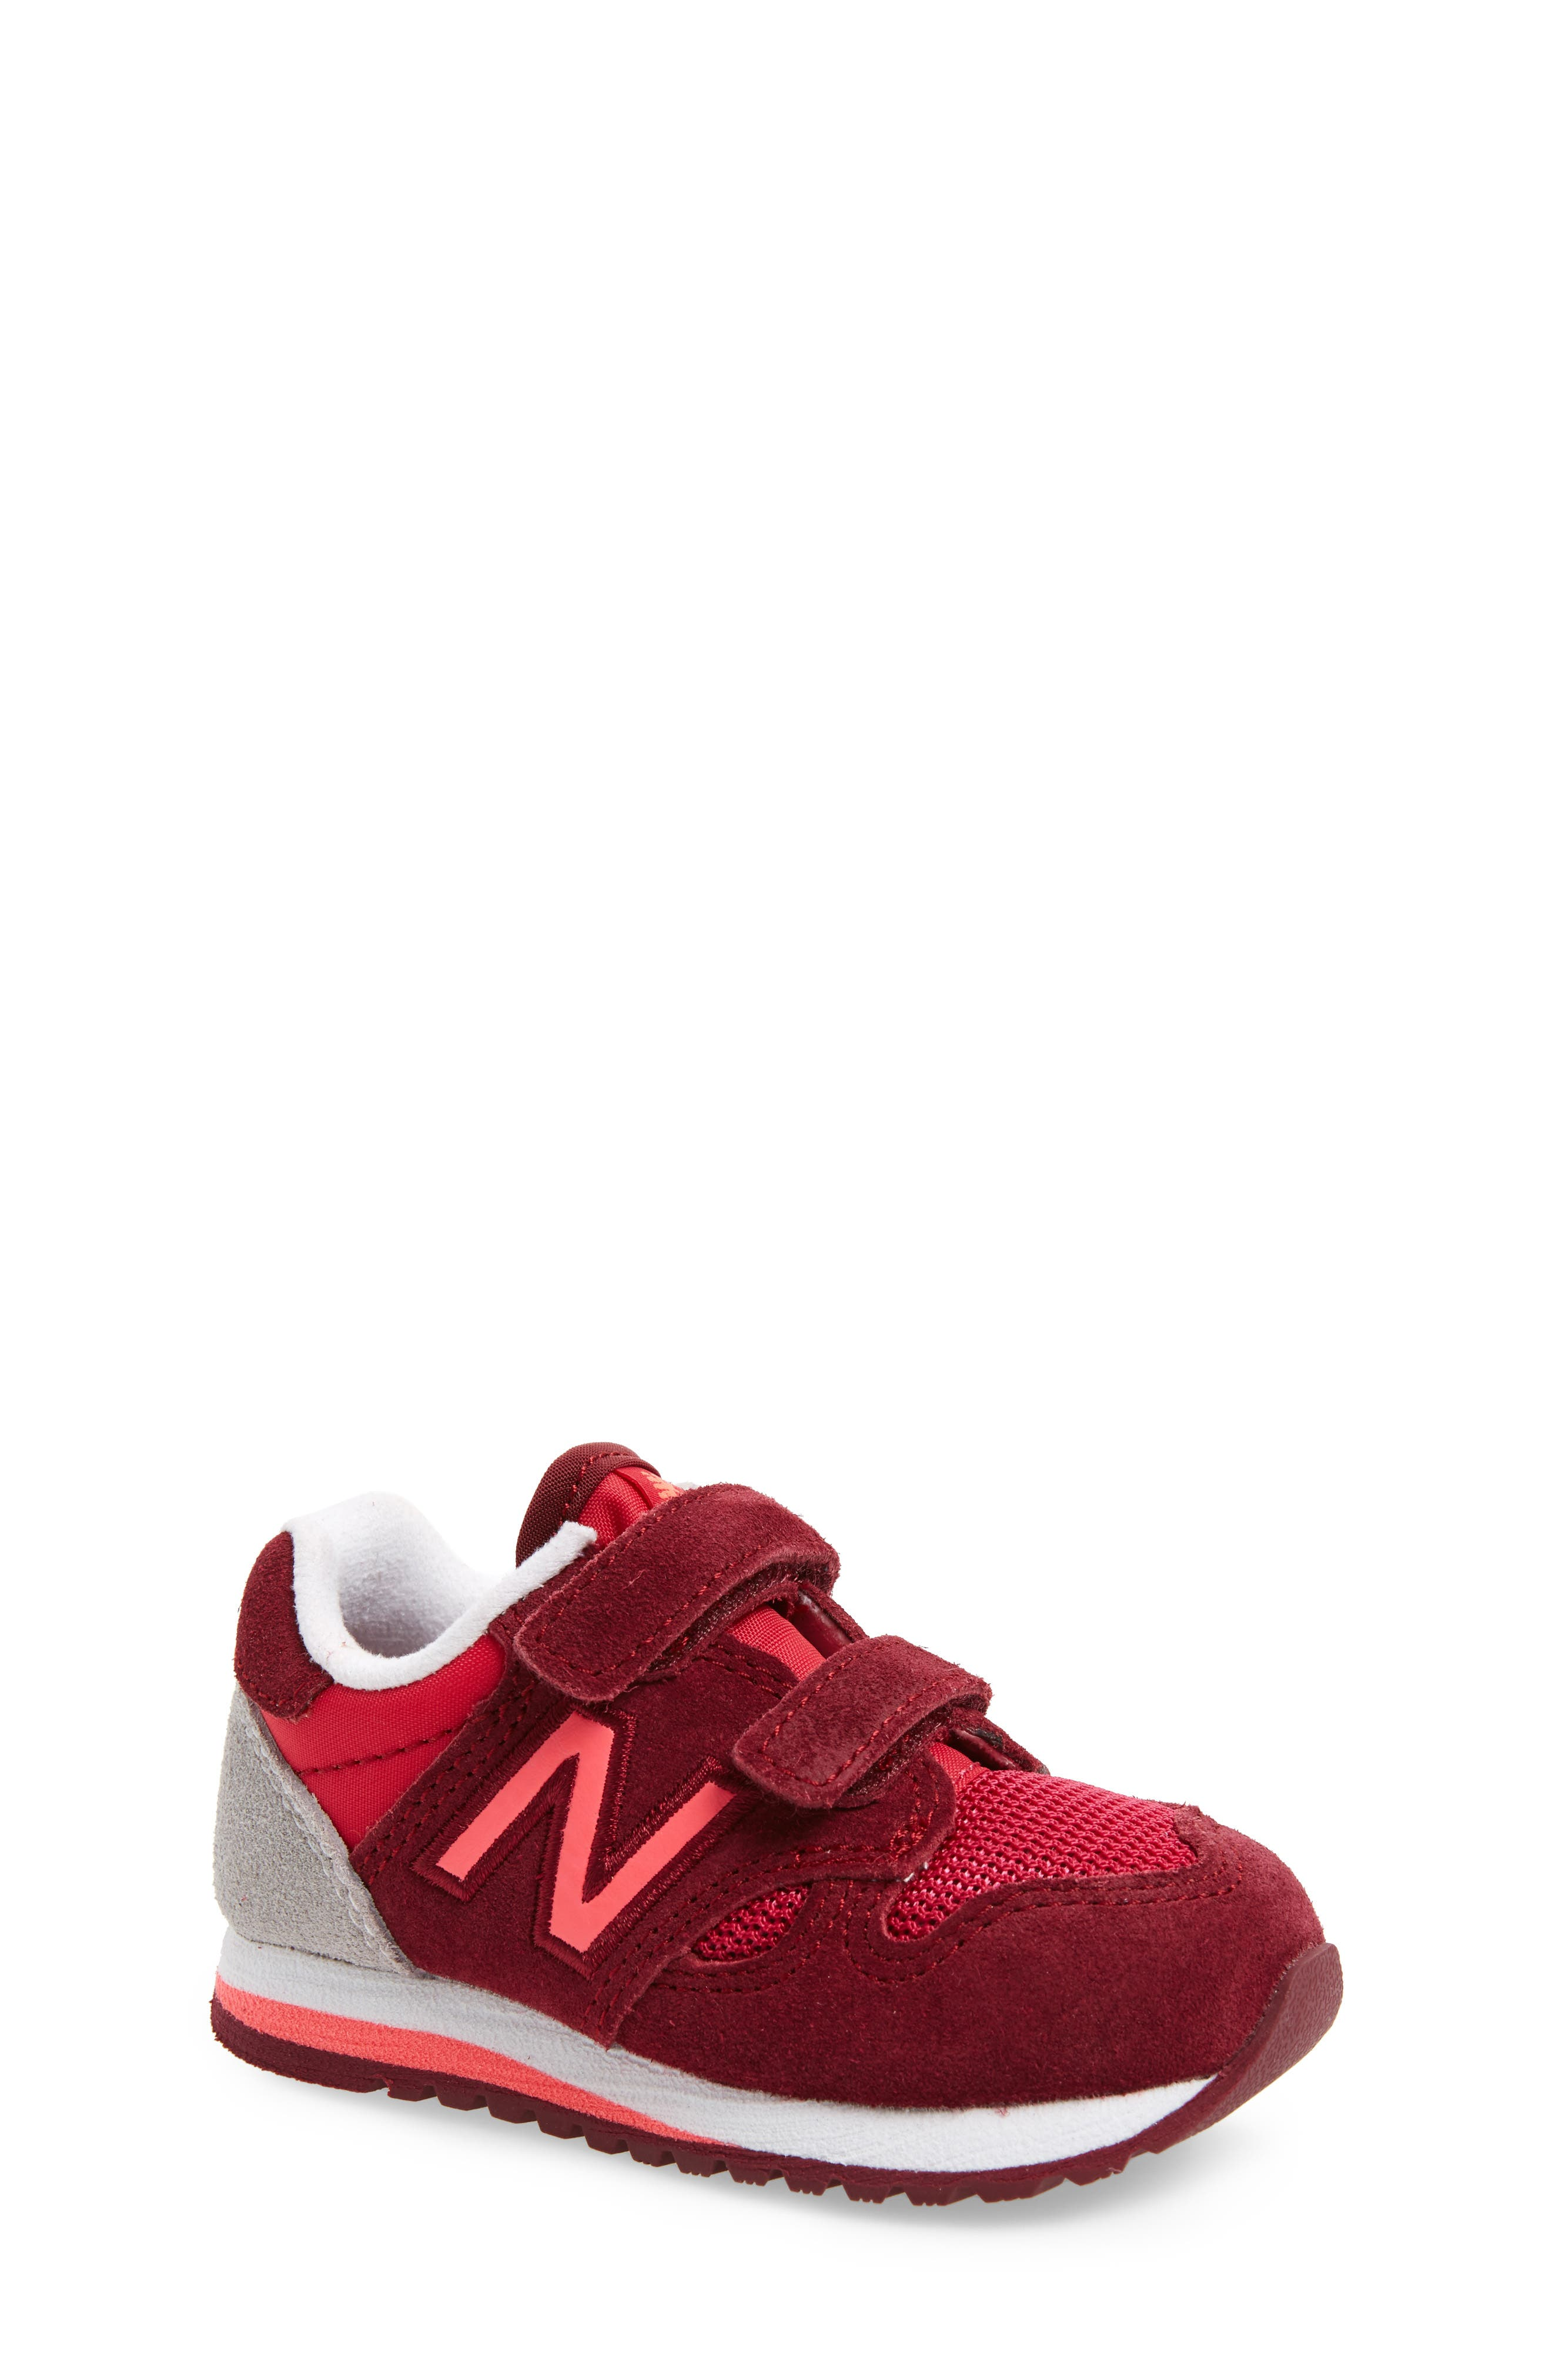 520 Sneaker,                             Main thumbnail 1, color,                             Pink/ Purple